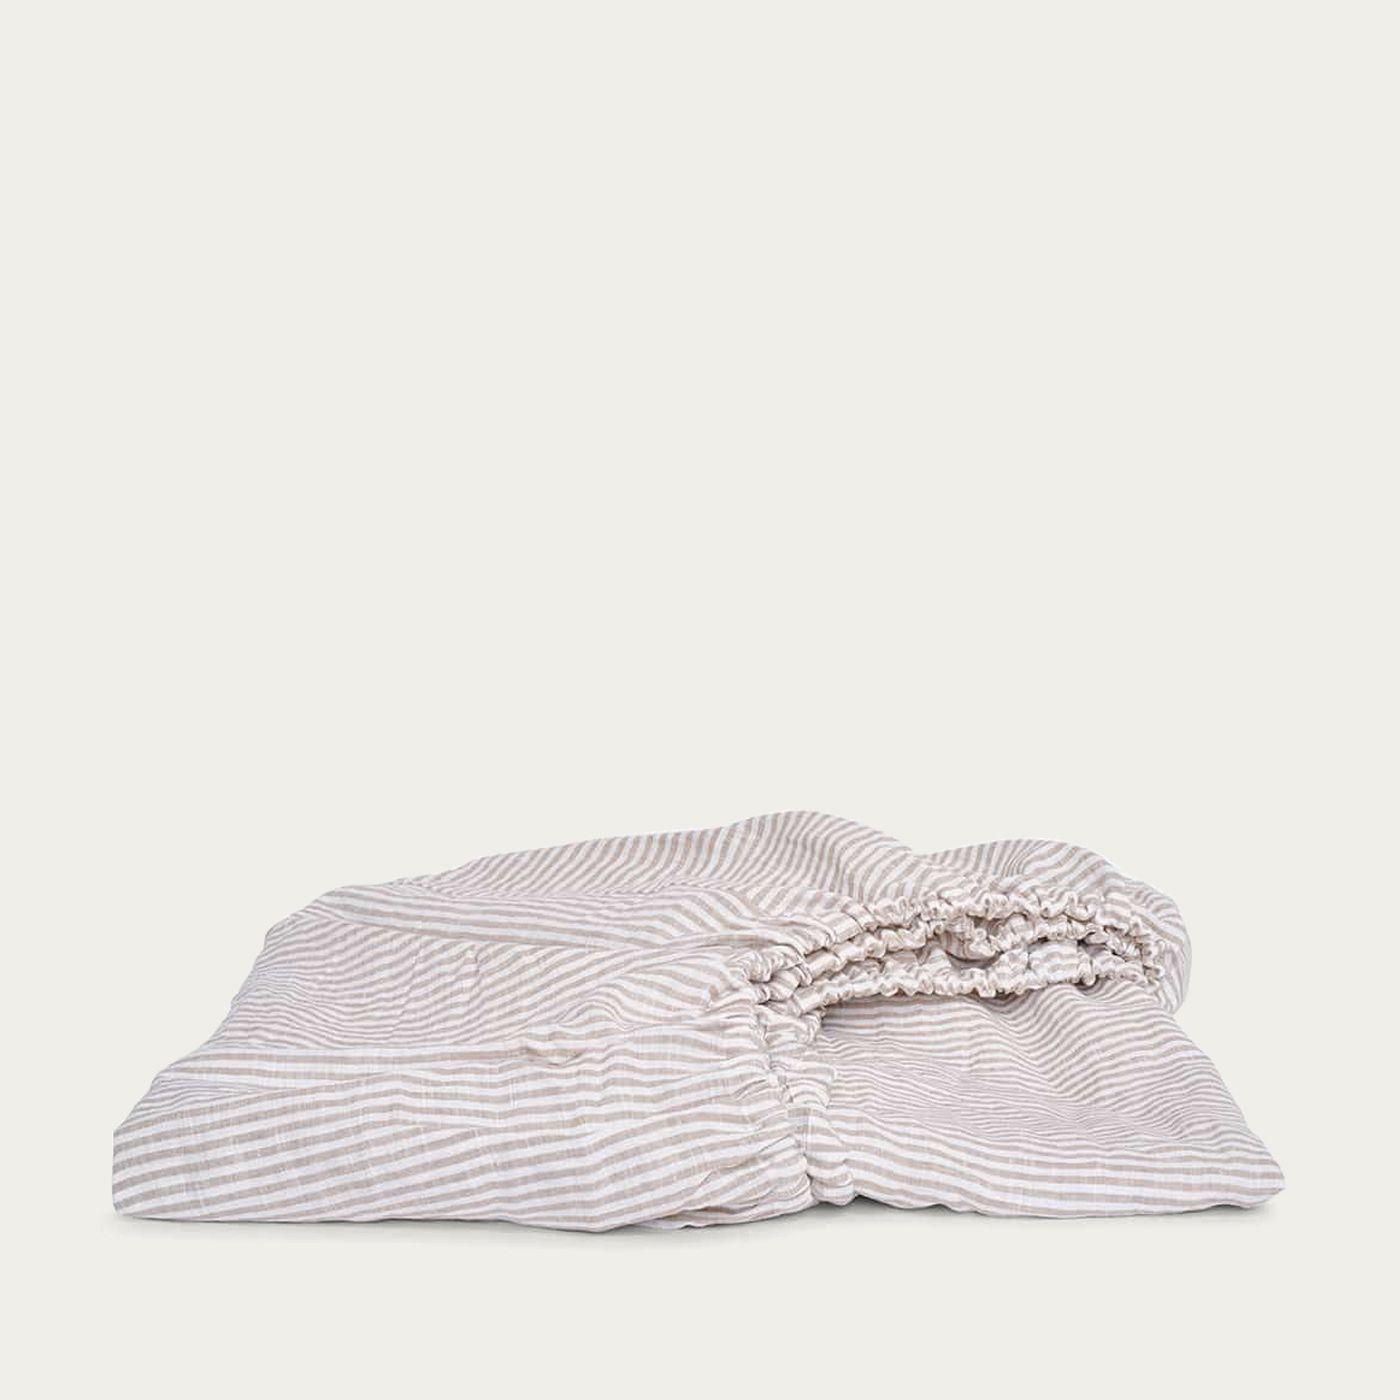 Beige/White Linen Fitted Sheet | Bombinate